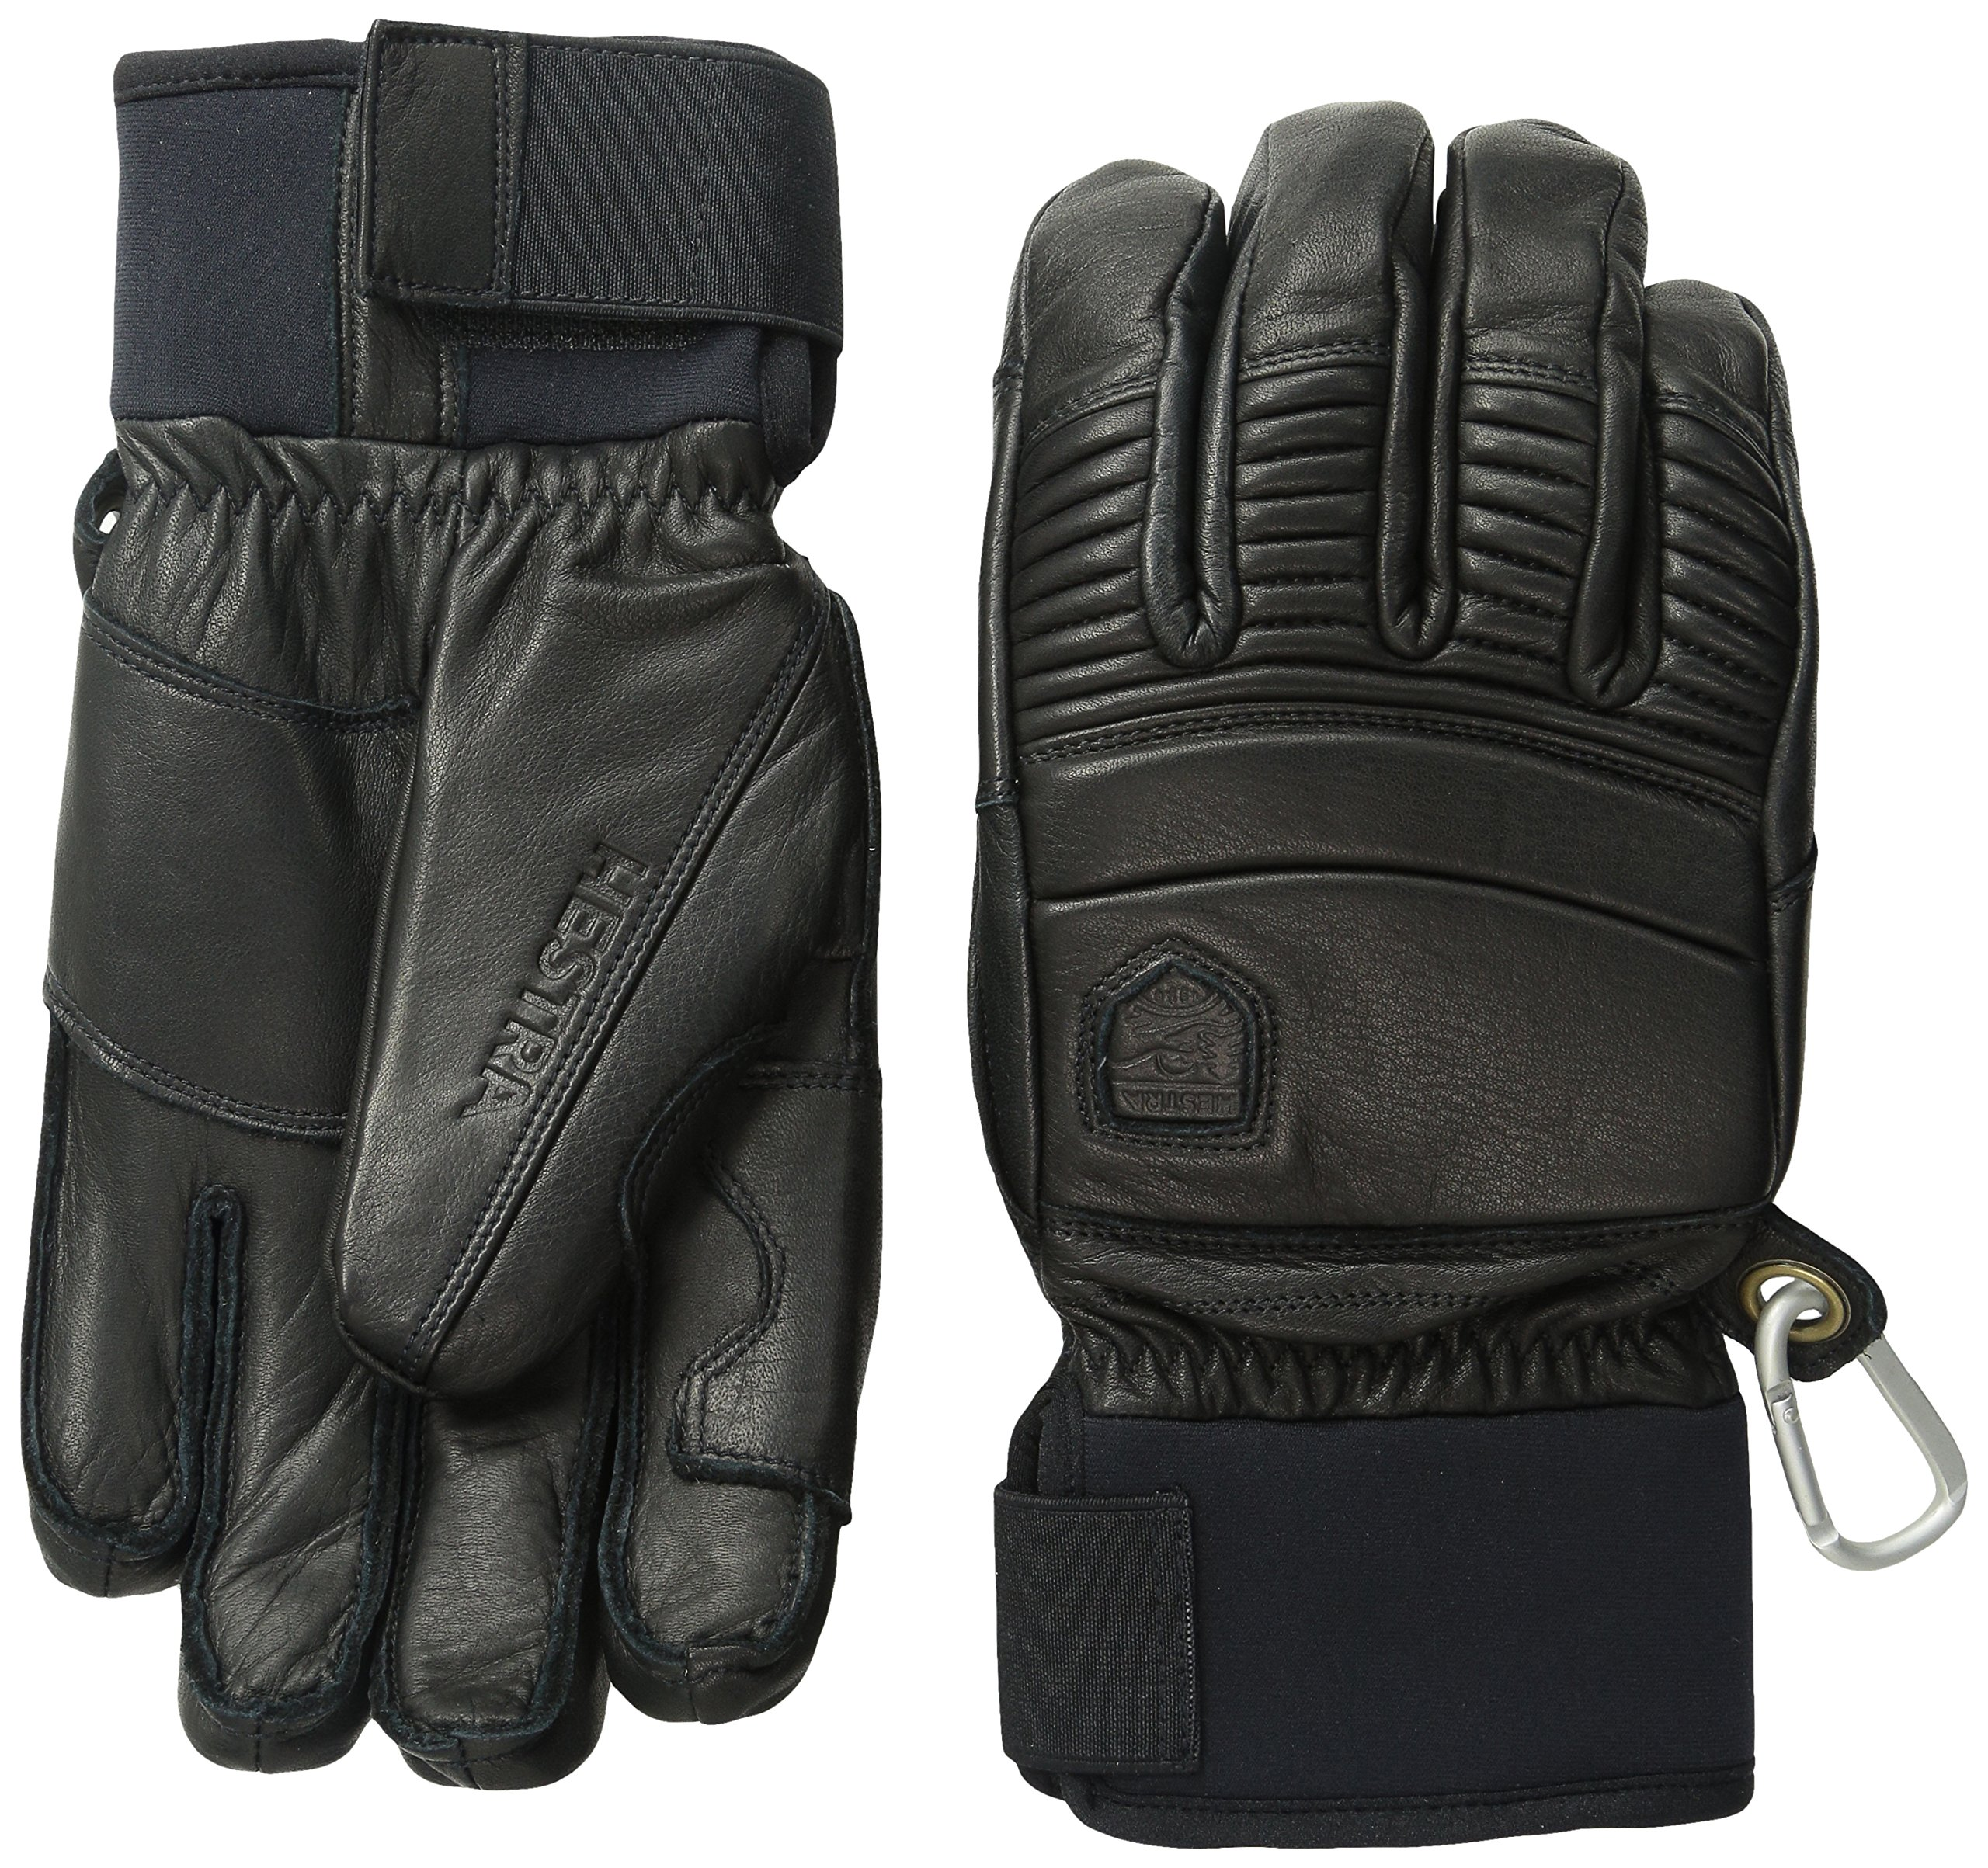 Hestra Fall Line Leather Short Ski, Ride and Park Glove,Black,8